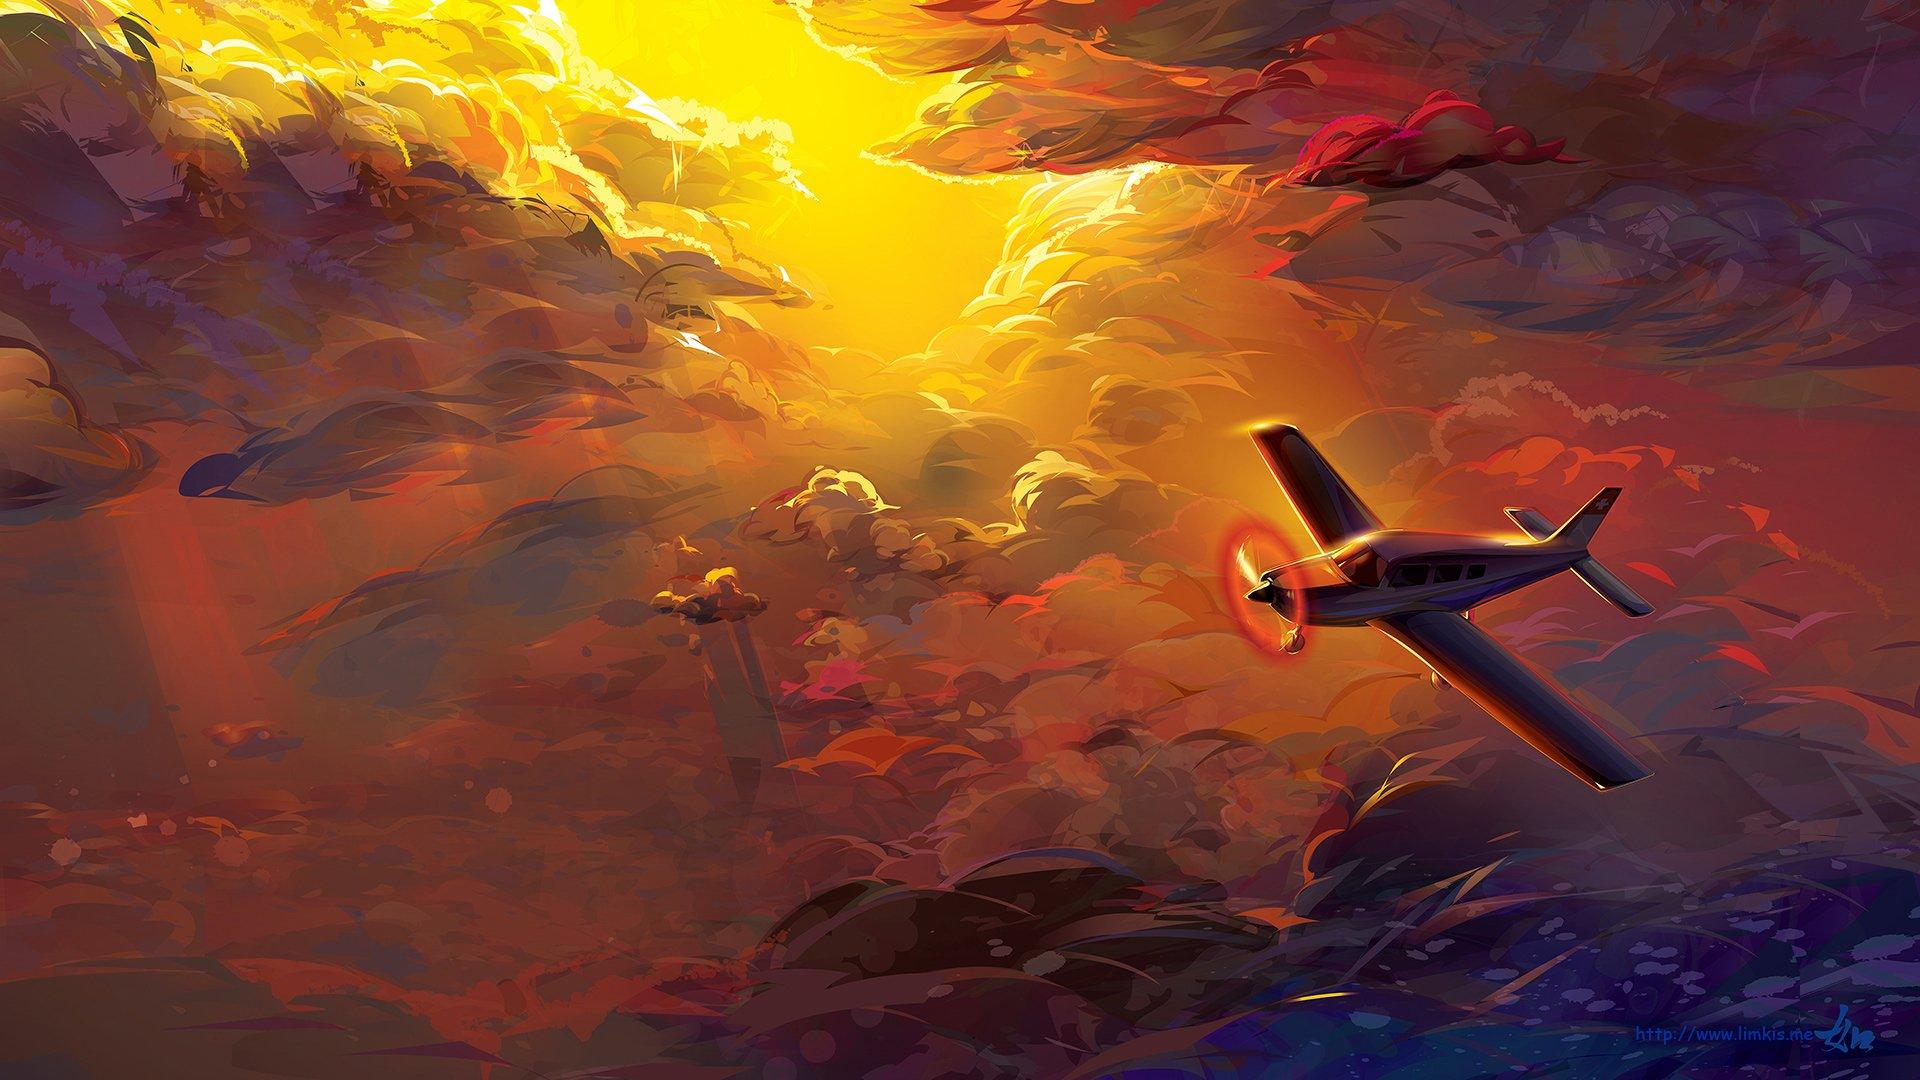 Artistic - Aircraft  Cloud Airplane Wallpaper